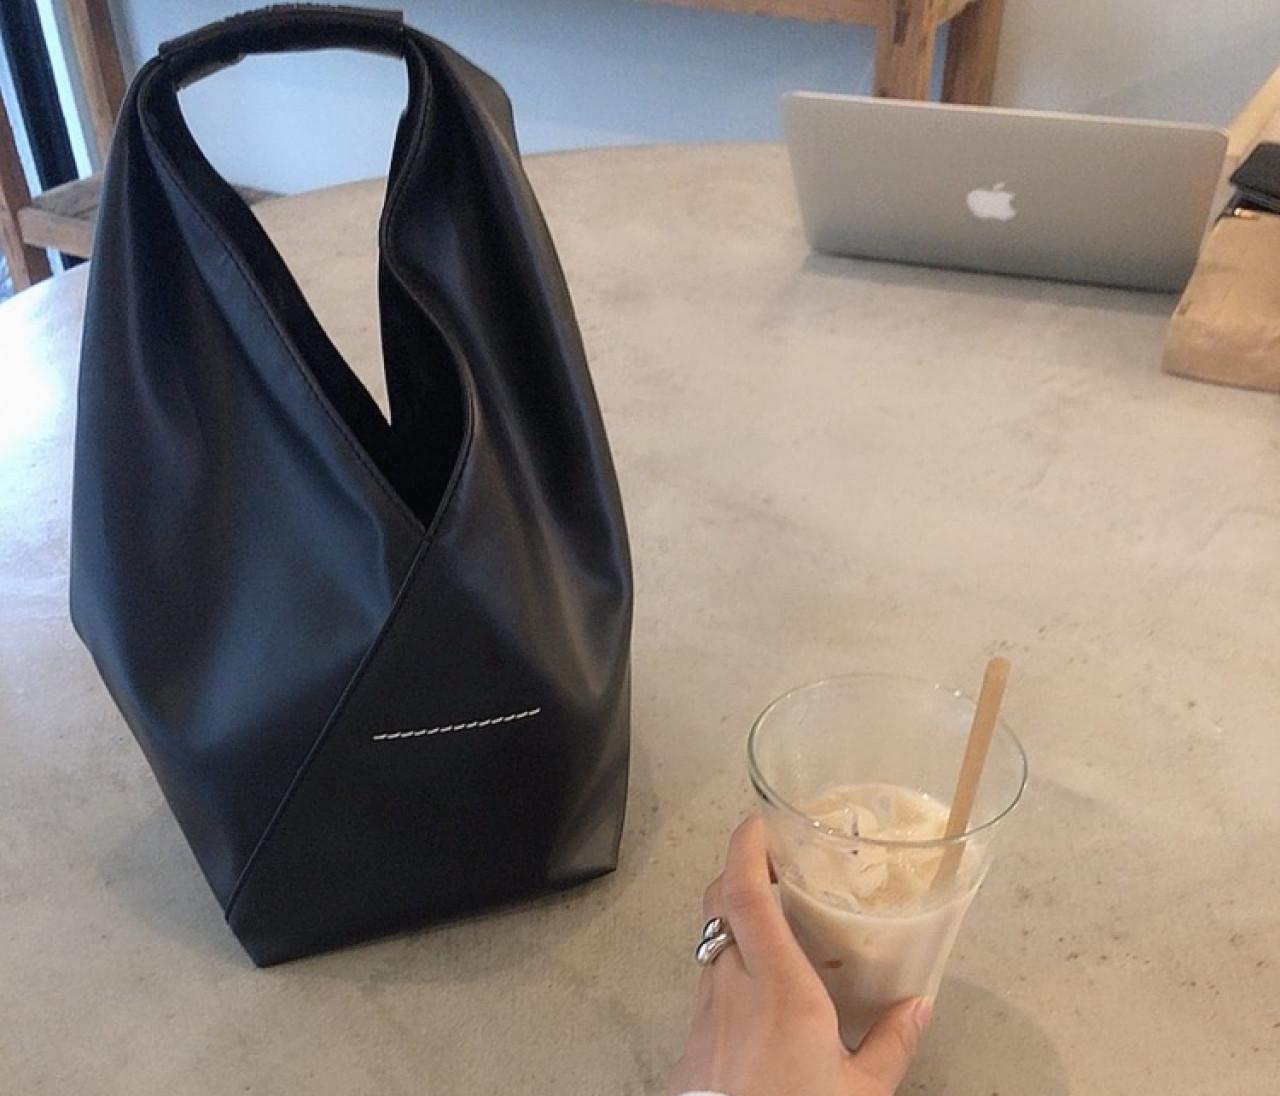 【Maison Margiela】手持ちバッグ 普段使いのアクセントに!